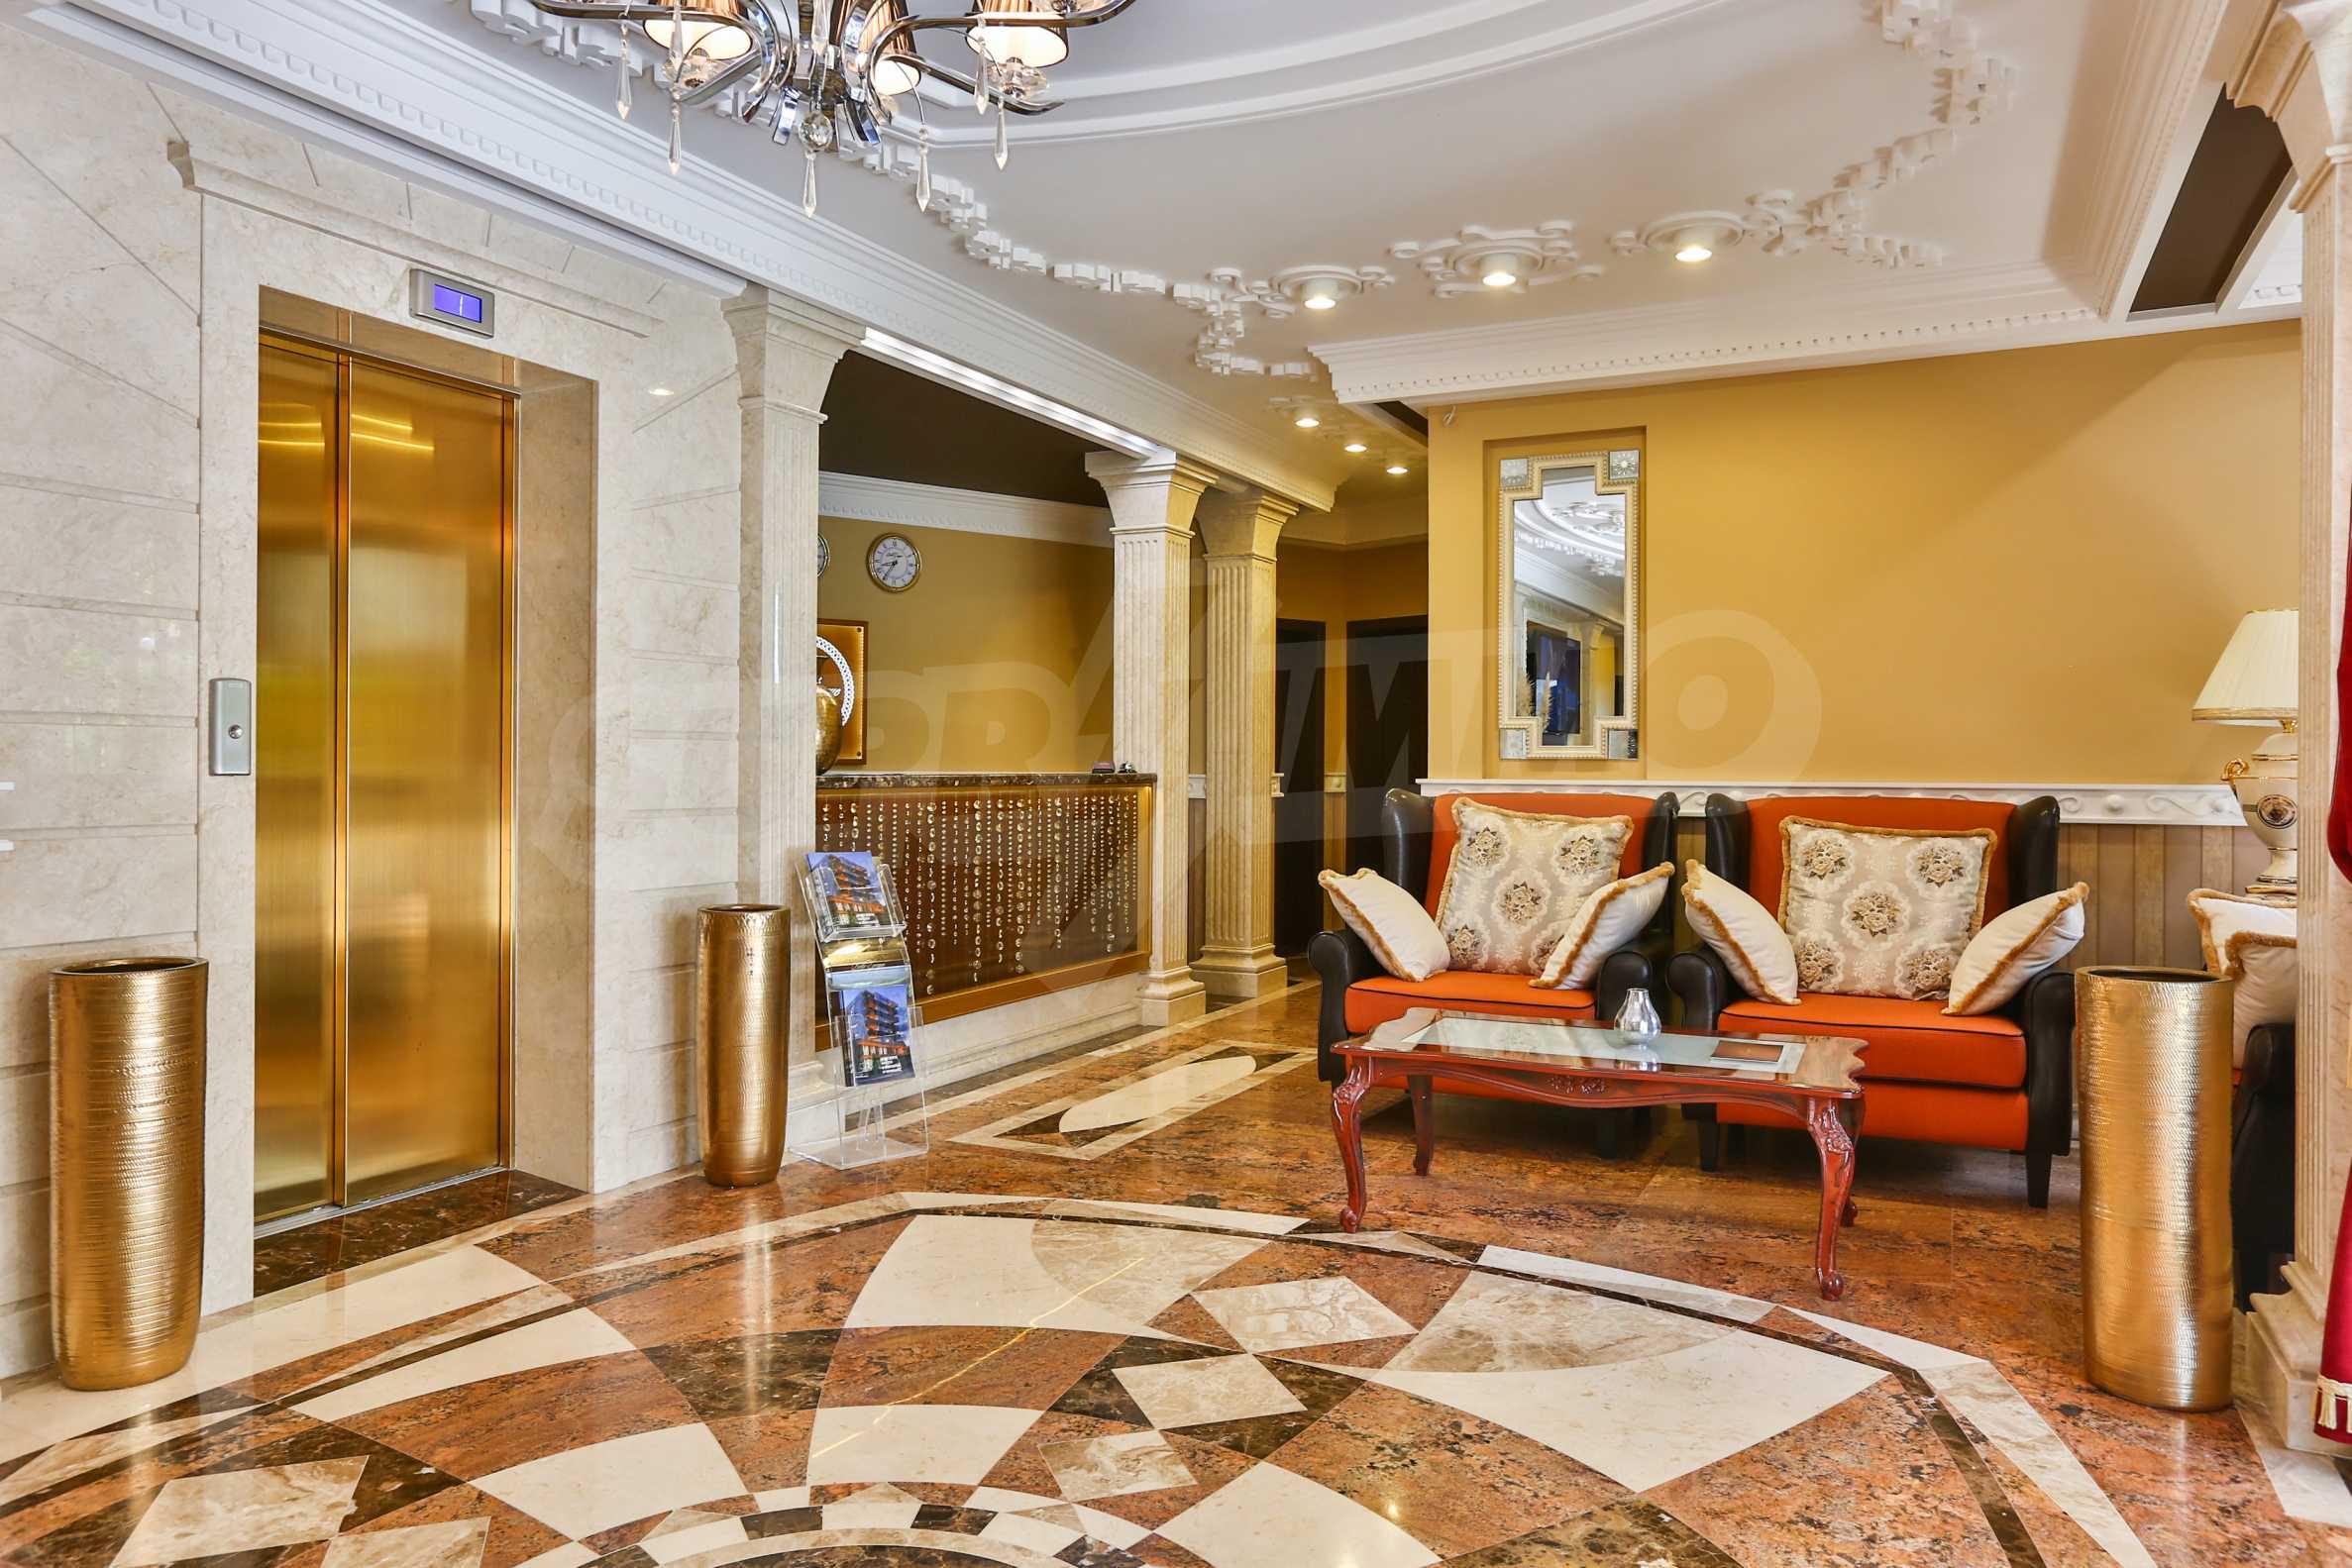 Exclusive 2-bedroom beachfront apartment in the prestigious Belle Époque Beach Residence 35